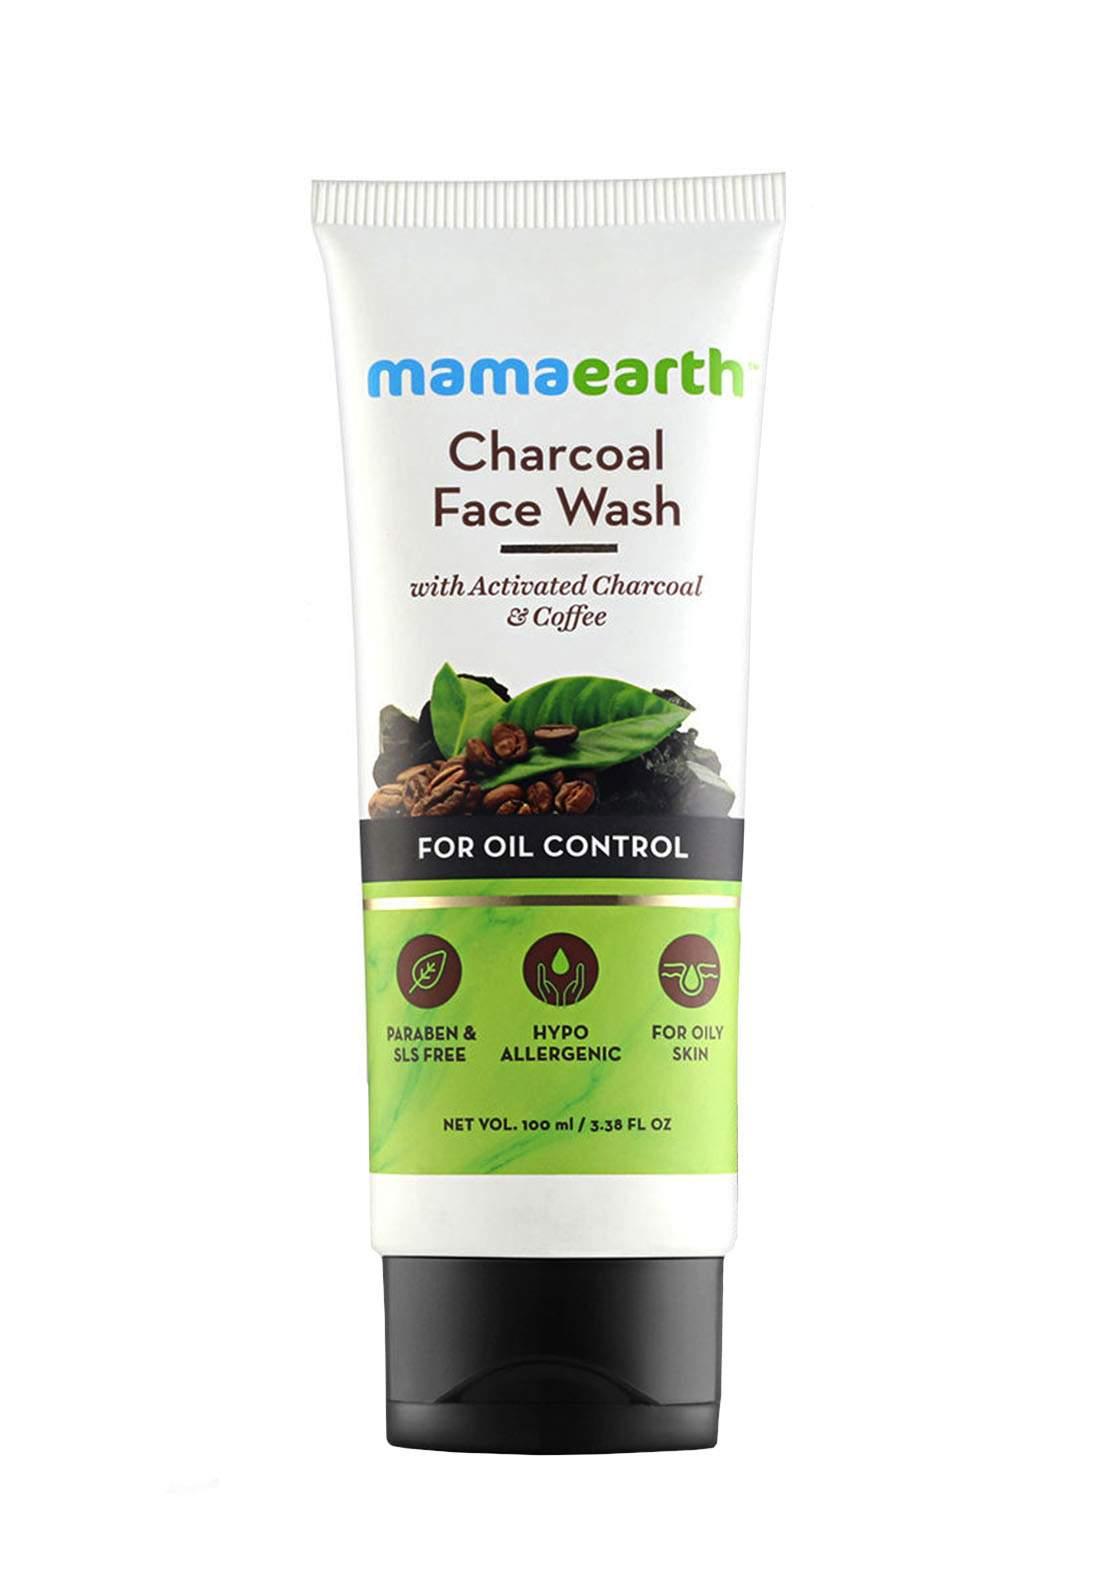 Mamaearth Charcoal Face Wash 100ml غسول للوجه